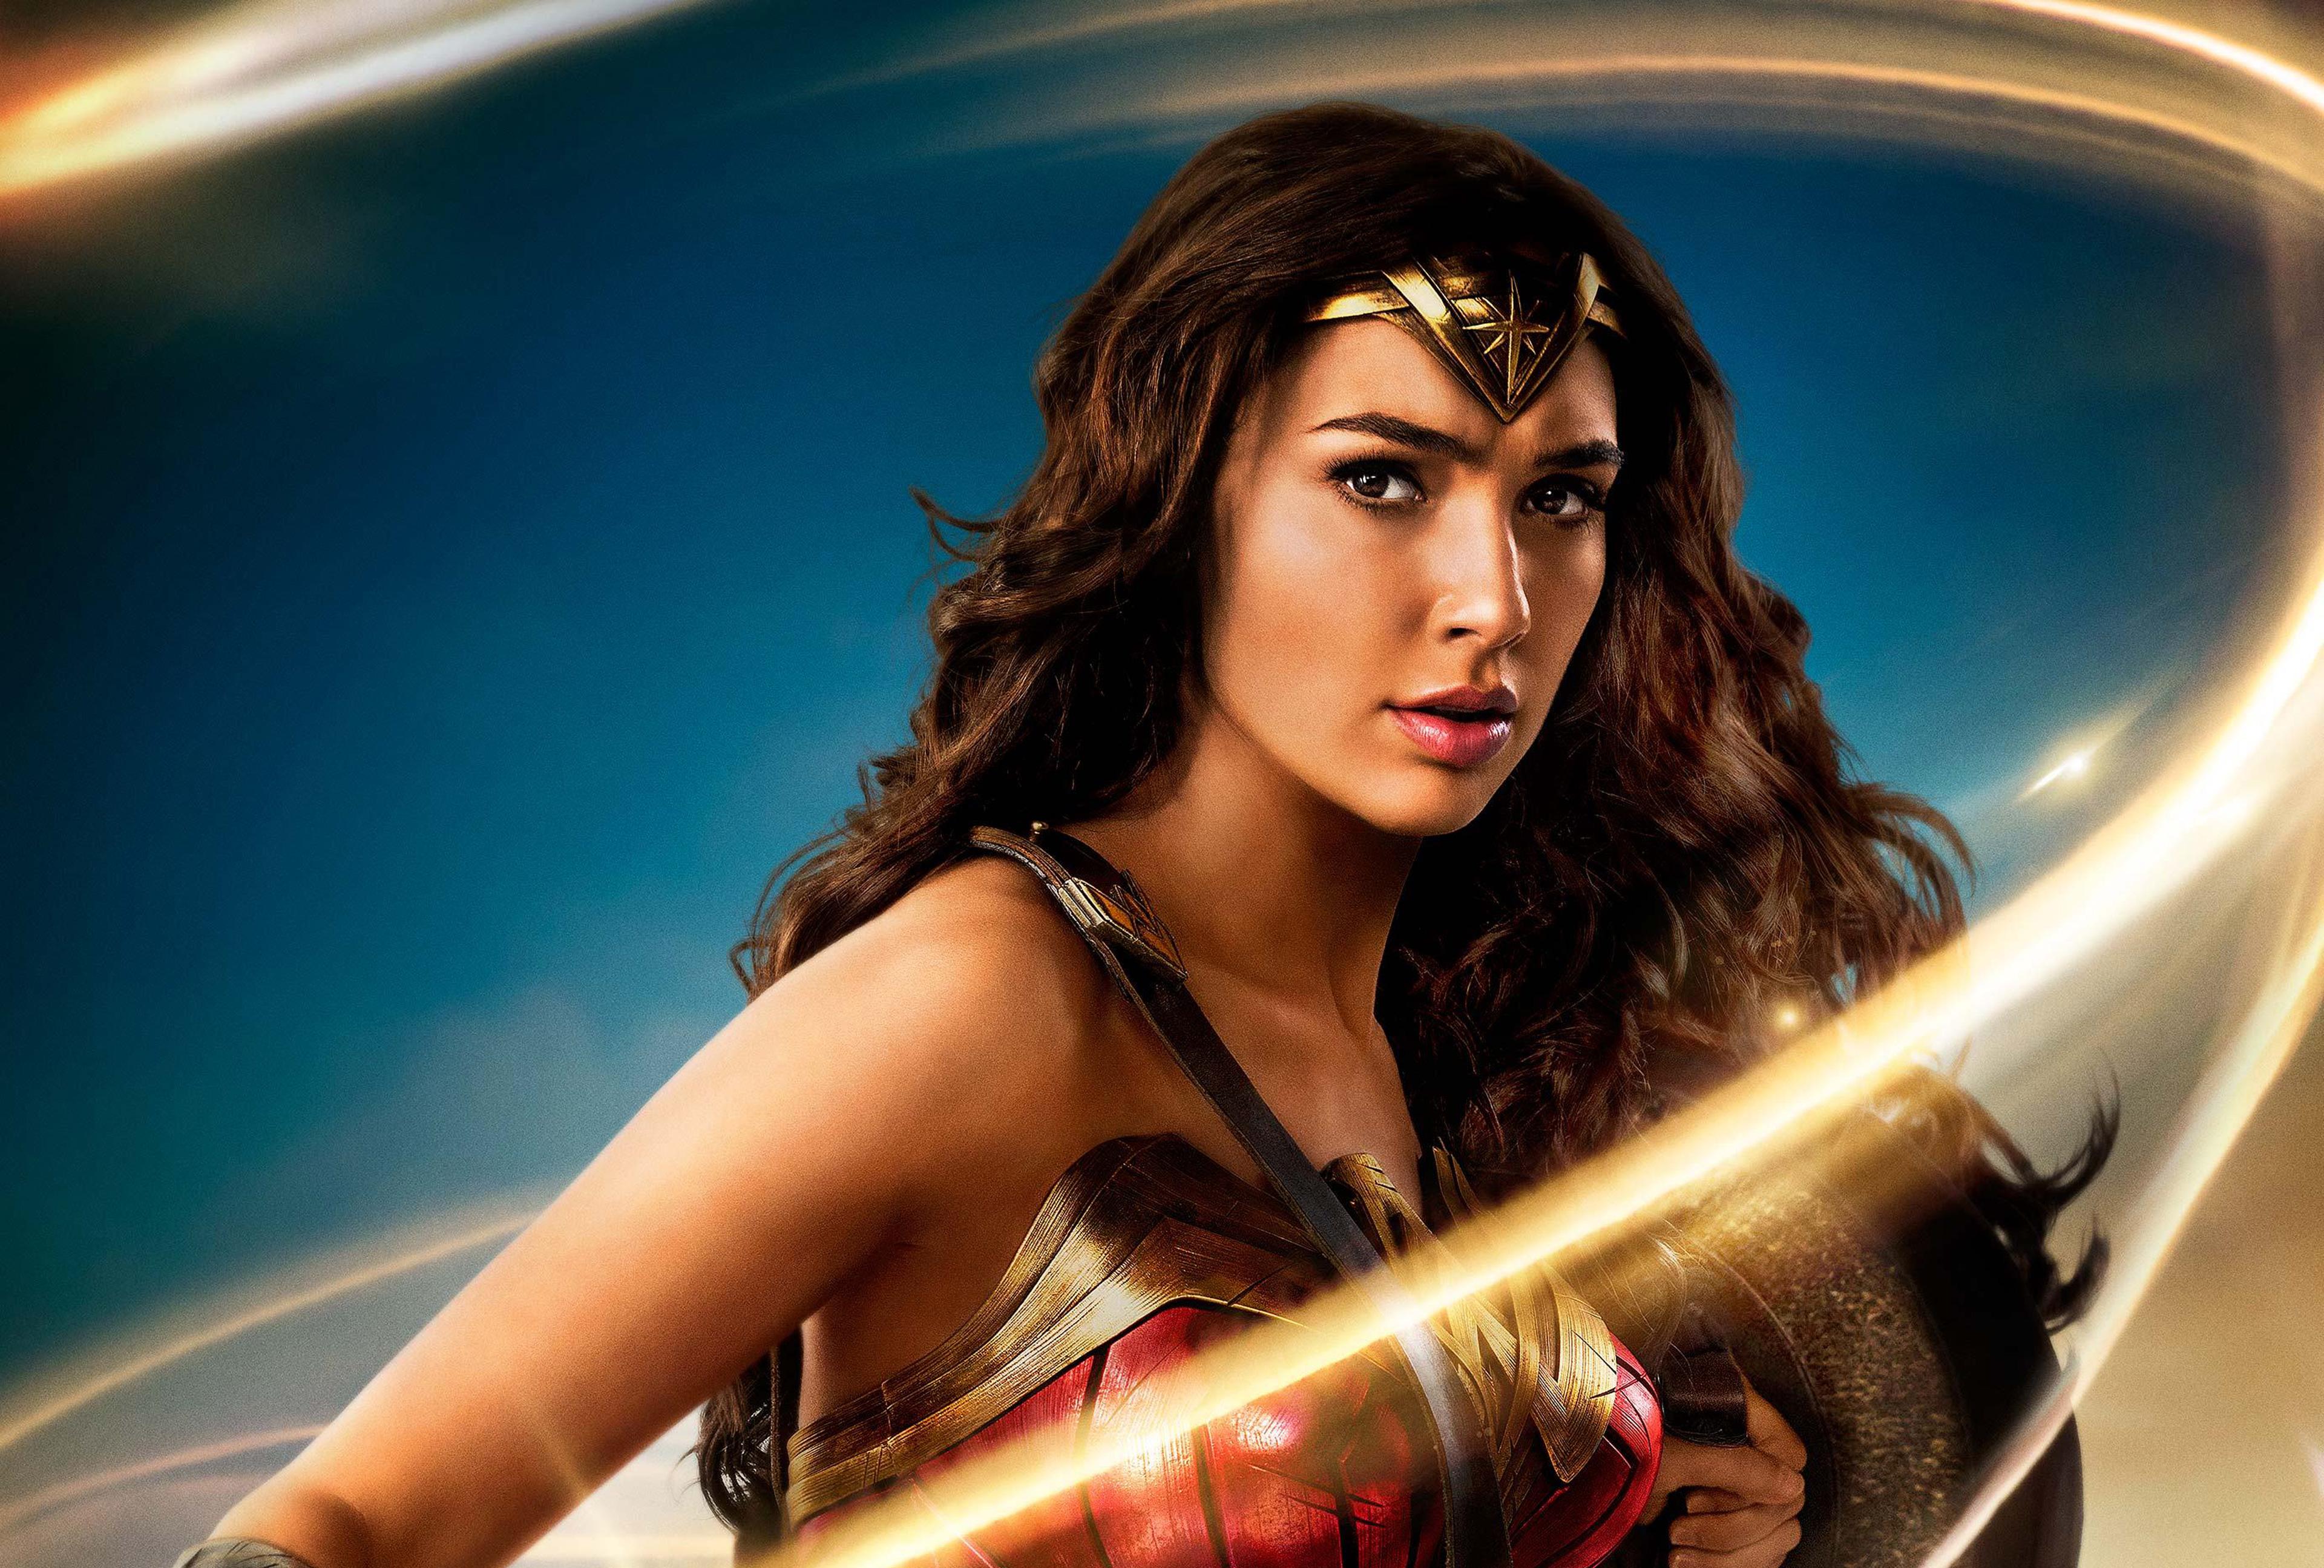 Wallpaper Wonder Woman Hd 4k 8k Movies 9526: Gal Gadot Wonder Woman New 4k, HD Movies, 4k Wallpapers